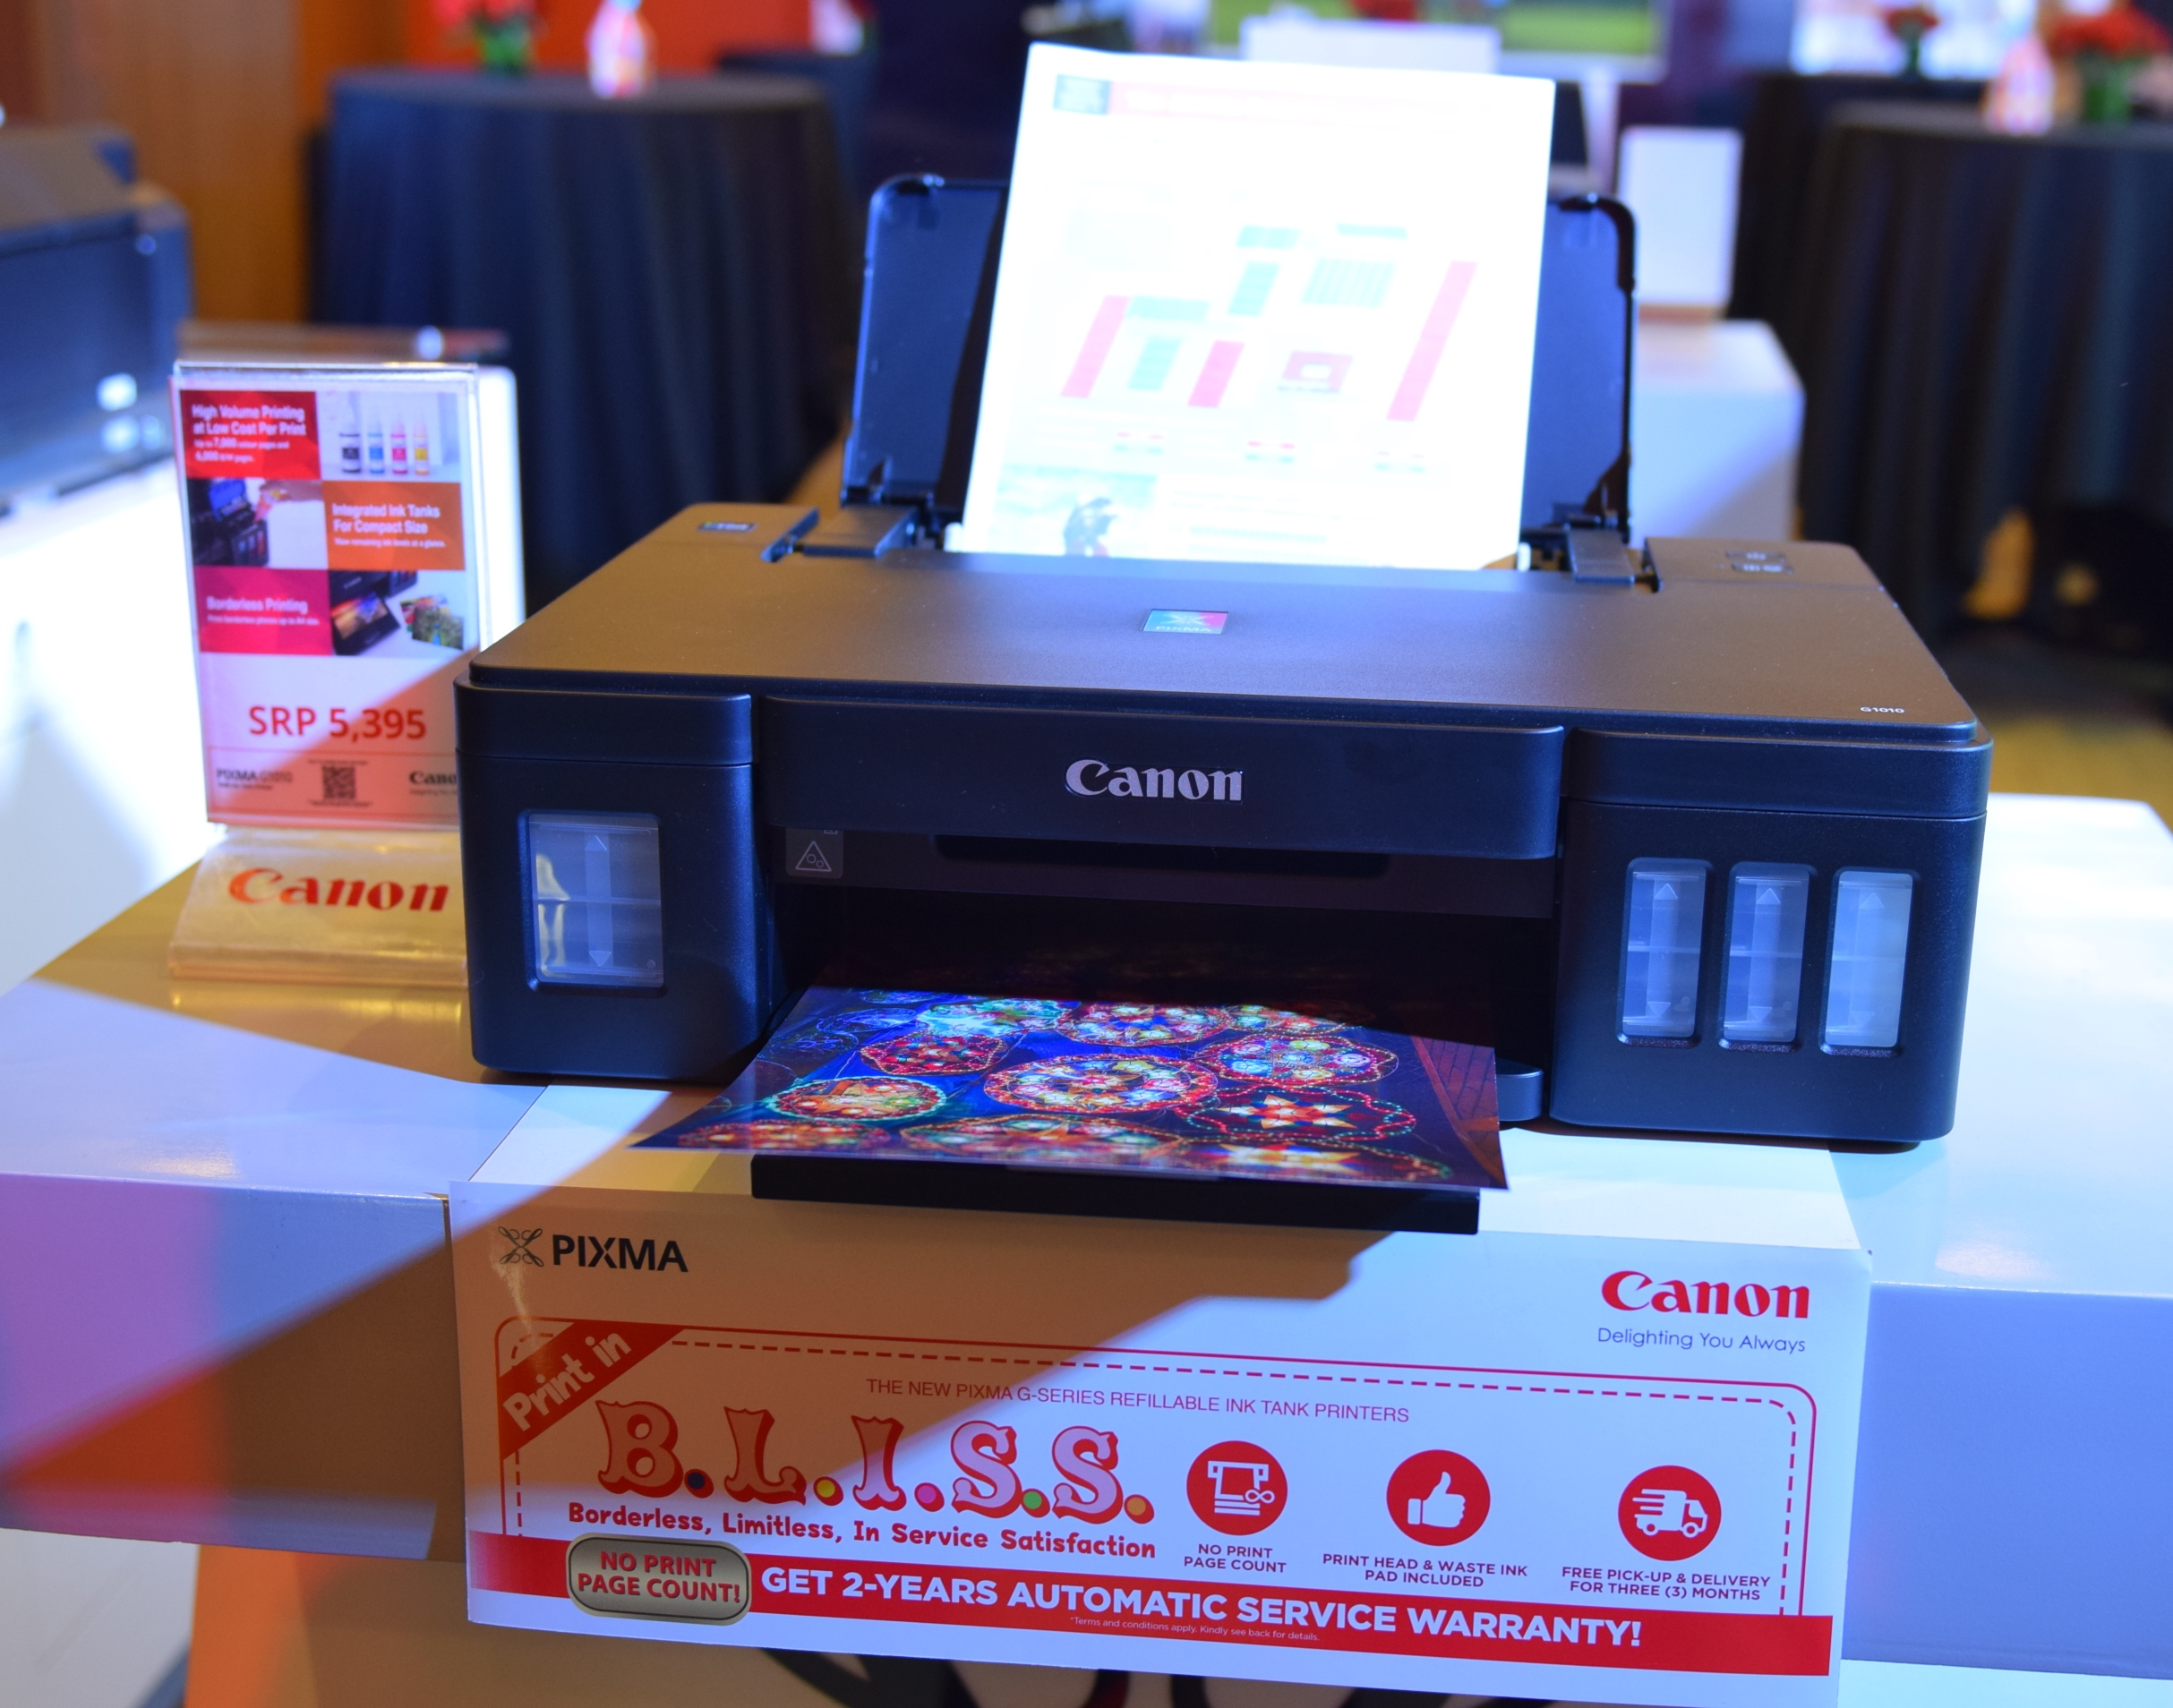 canon, canon g series, low cost printing, pixma, printers